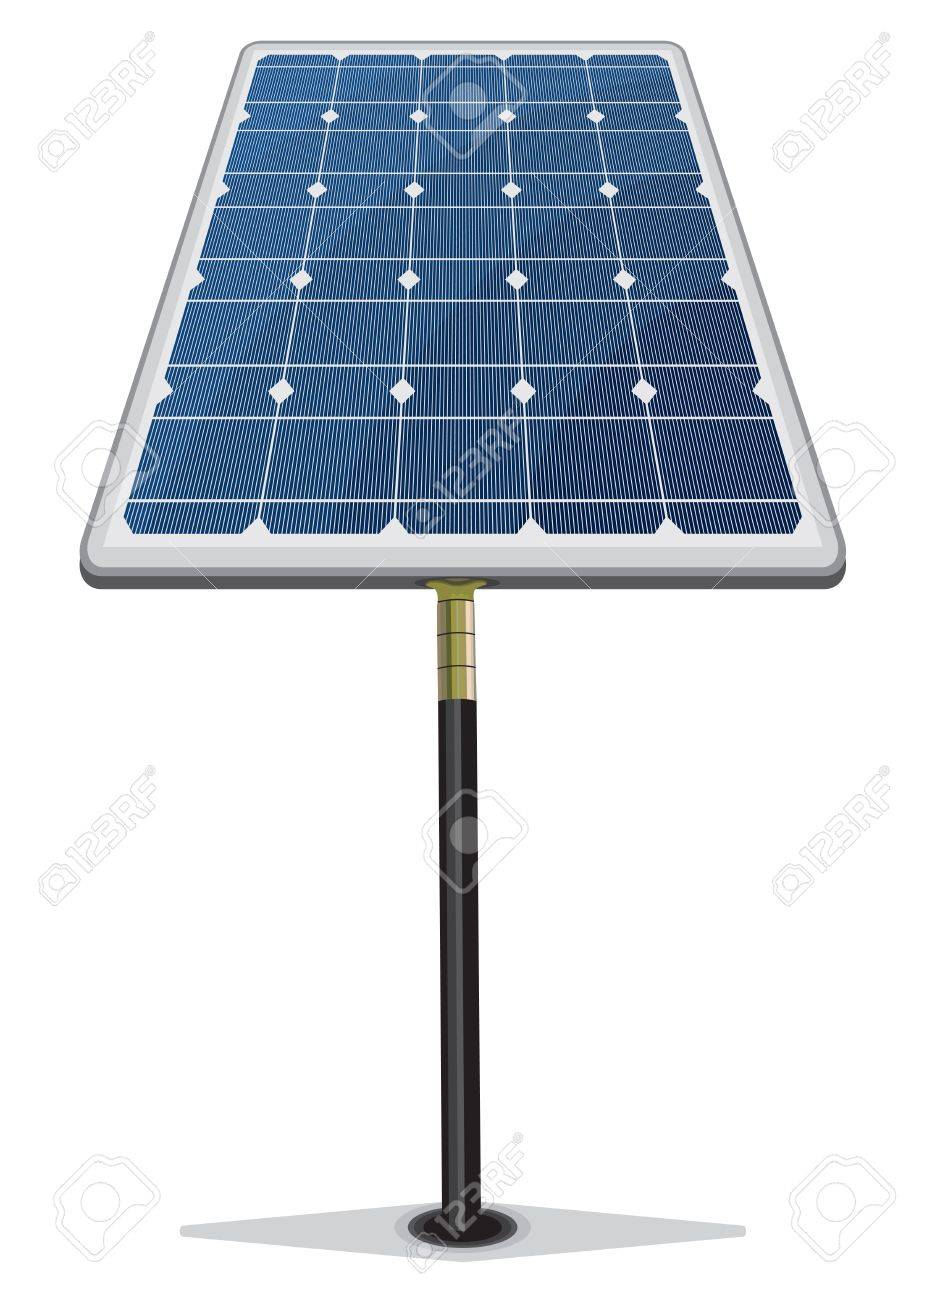 Solar Panel Stock Vector - 18579644